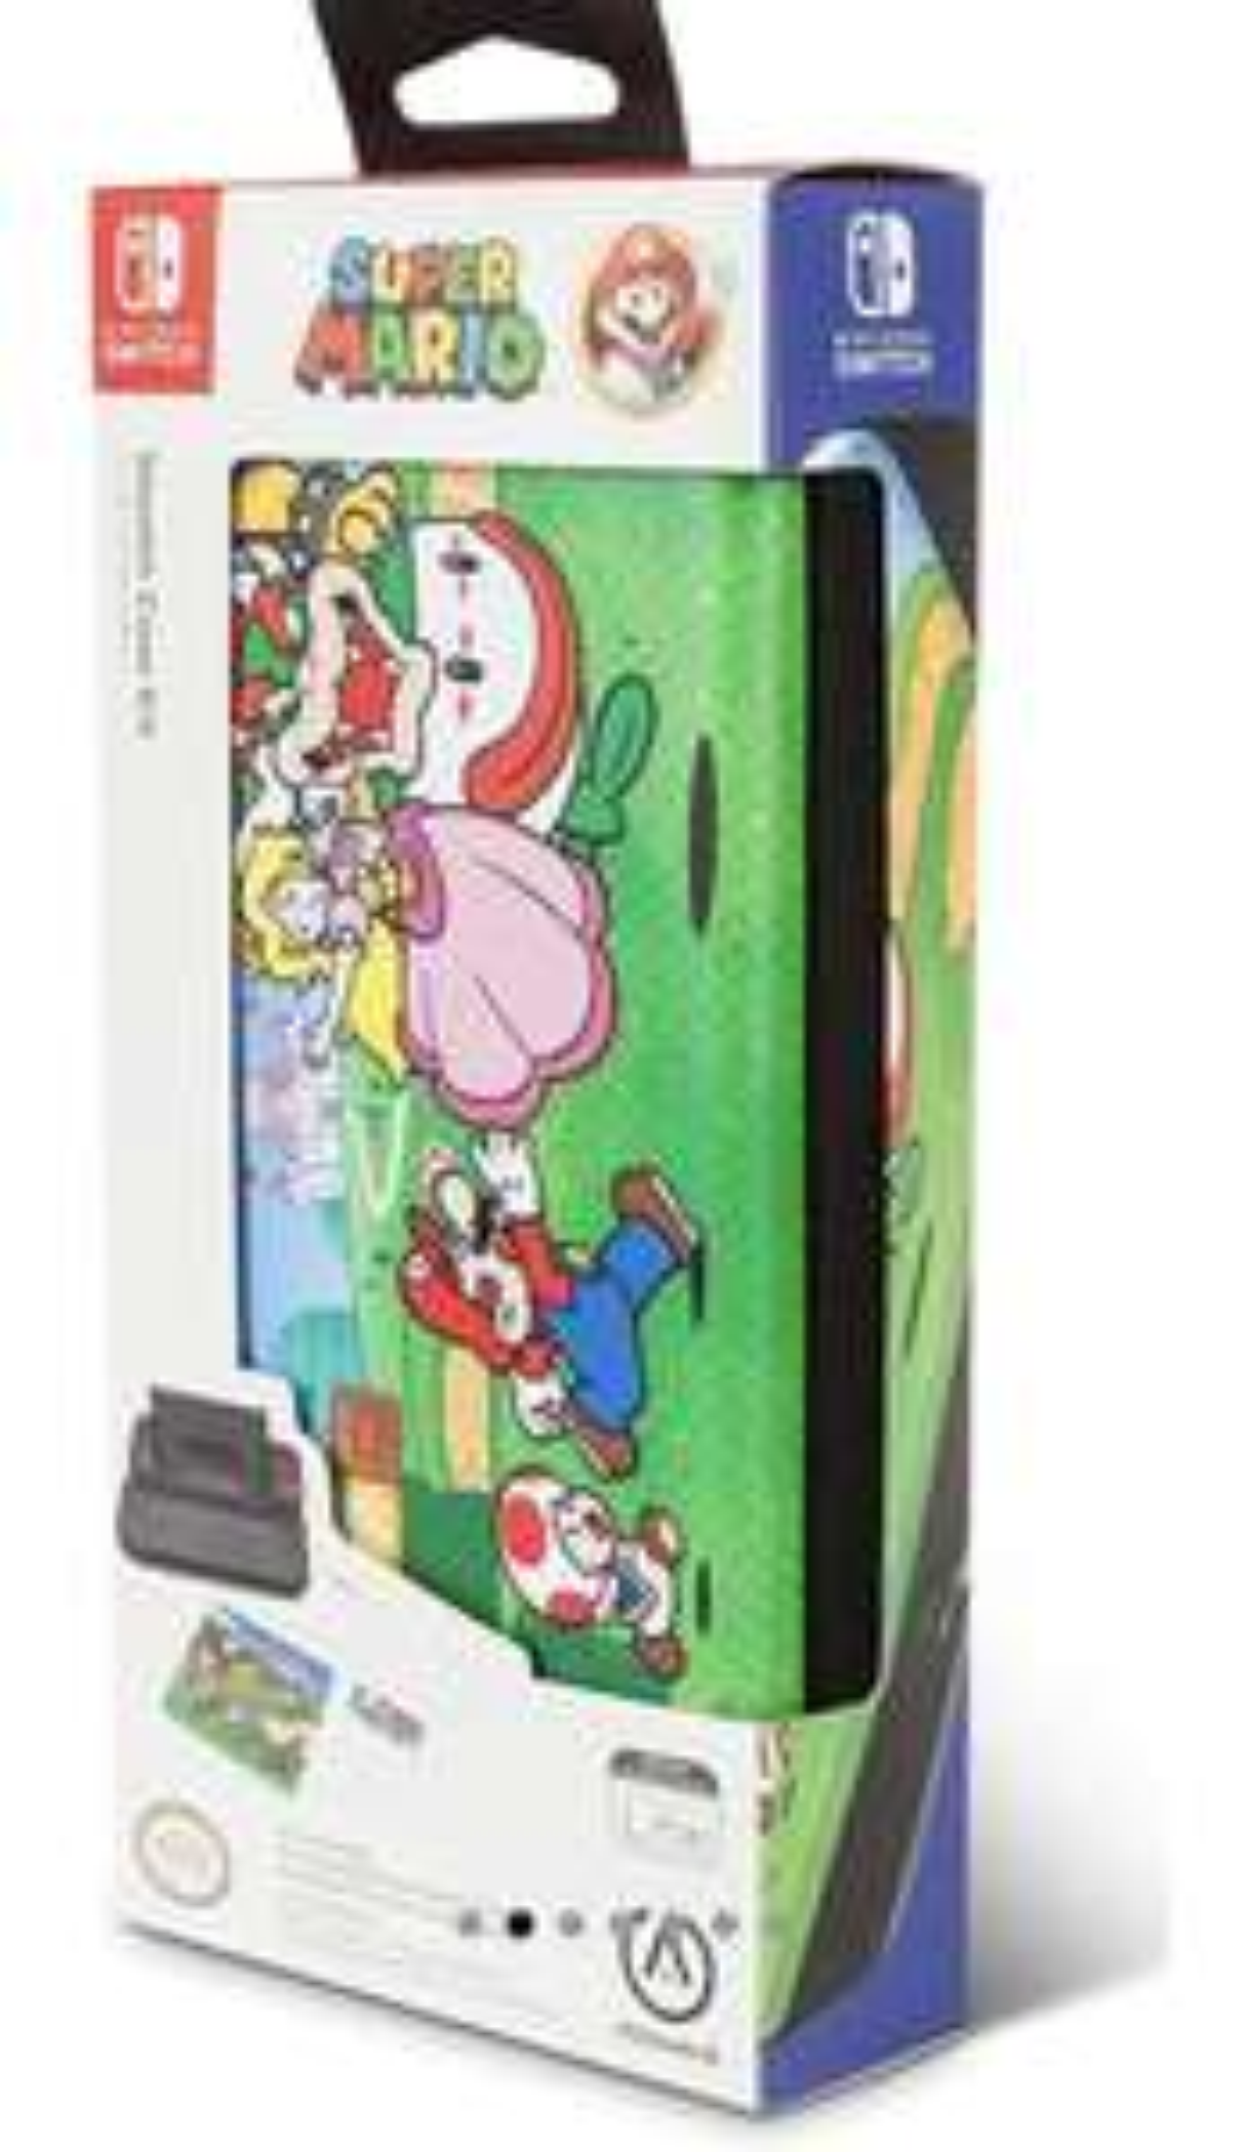 Nintendo Switch Case Kit - Super Mario Mushroom Kingdom - 2p at Asda Parkhead Forge Glasgow